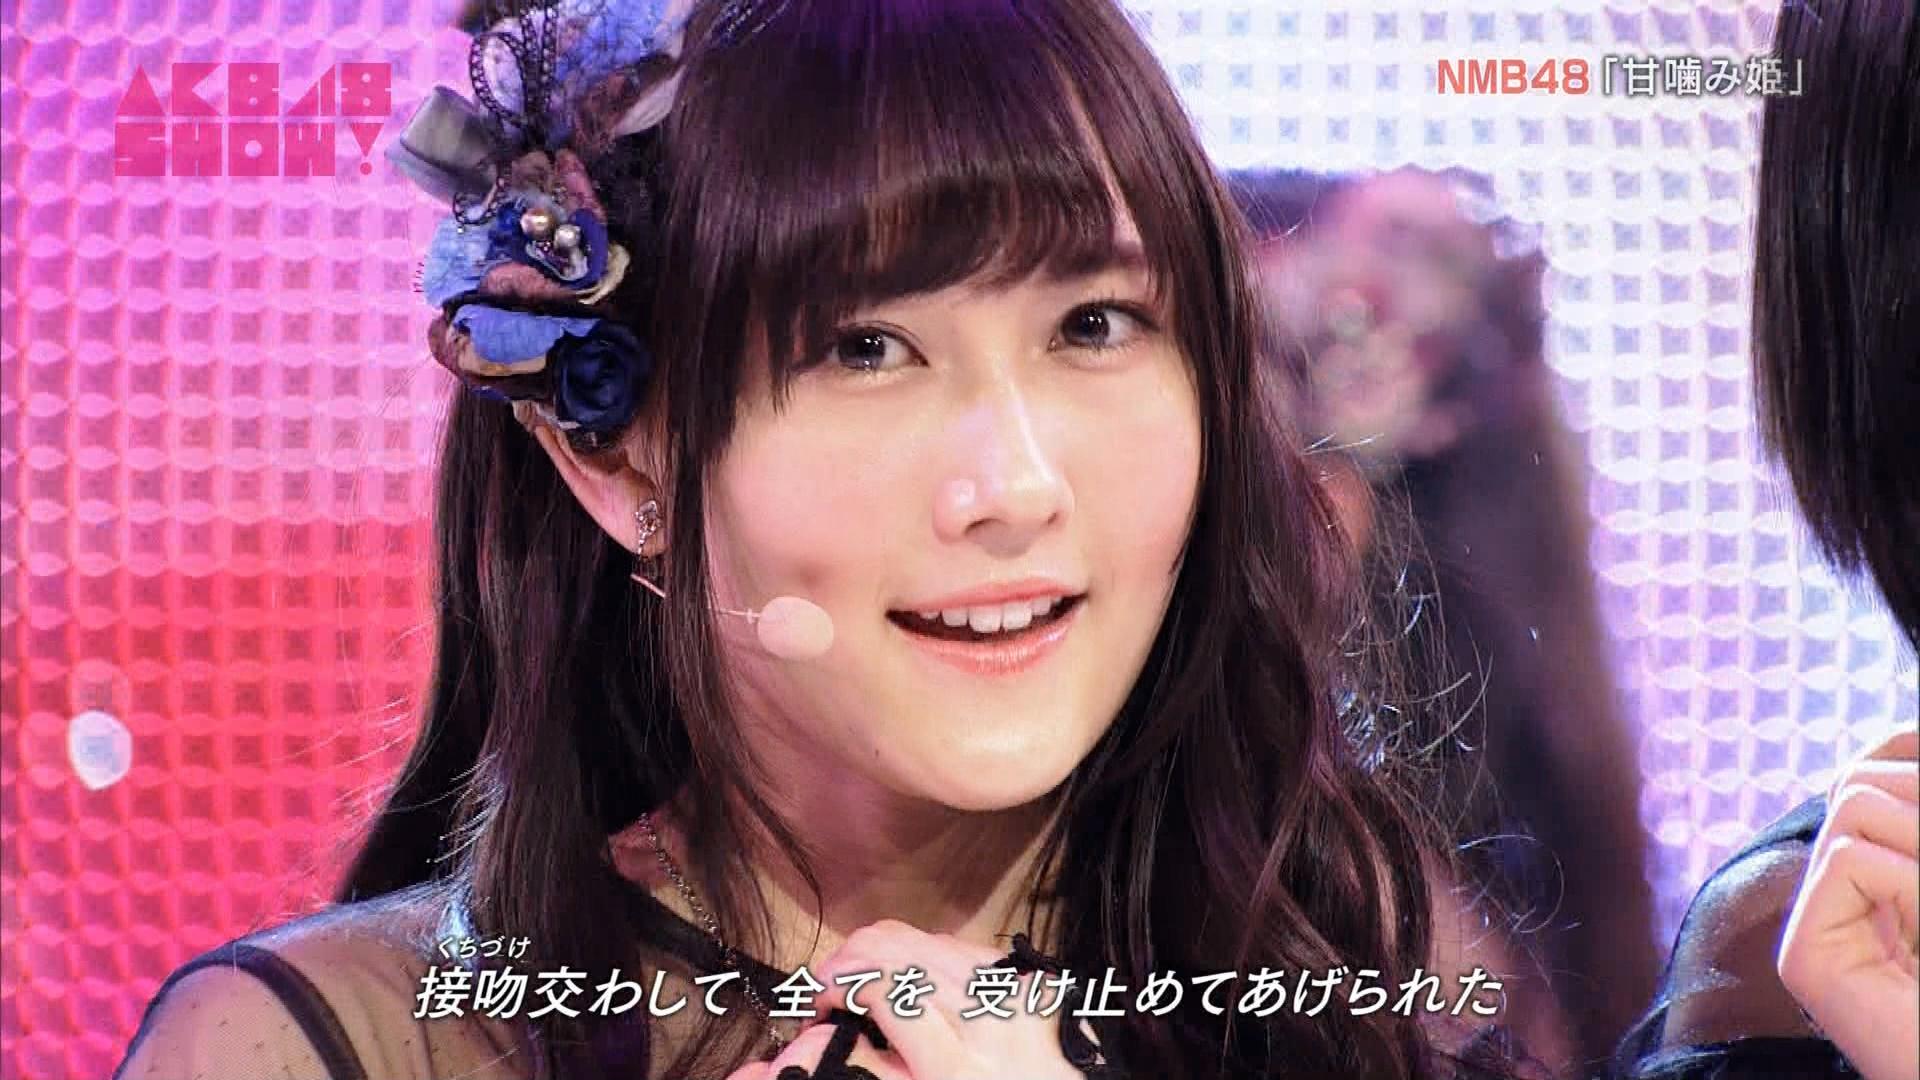 【NMB48】矢倉楓子 応援スレ☆56【ふぅちゃん】YouTube動画>27本 ->画像>226枚